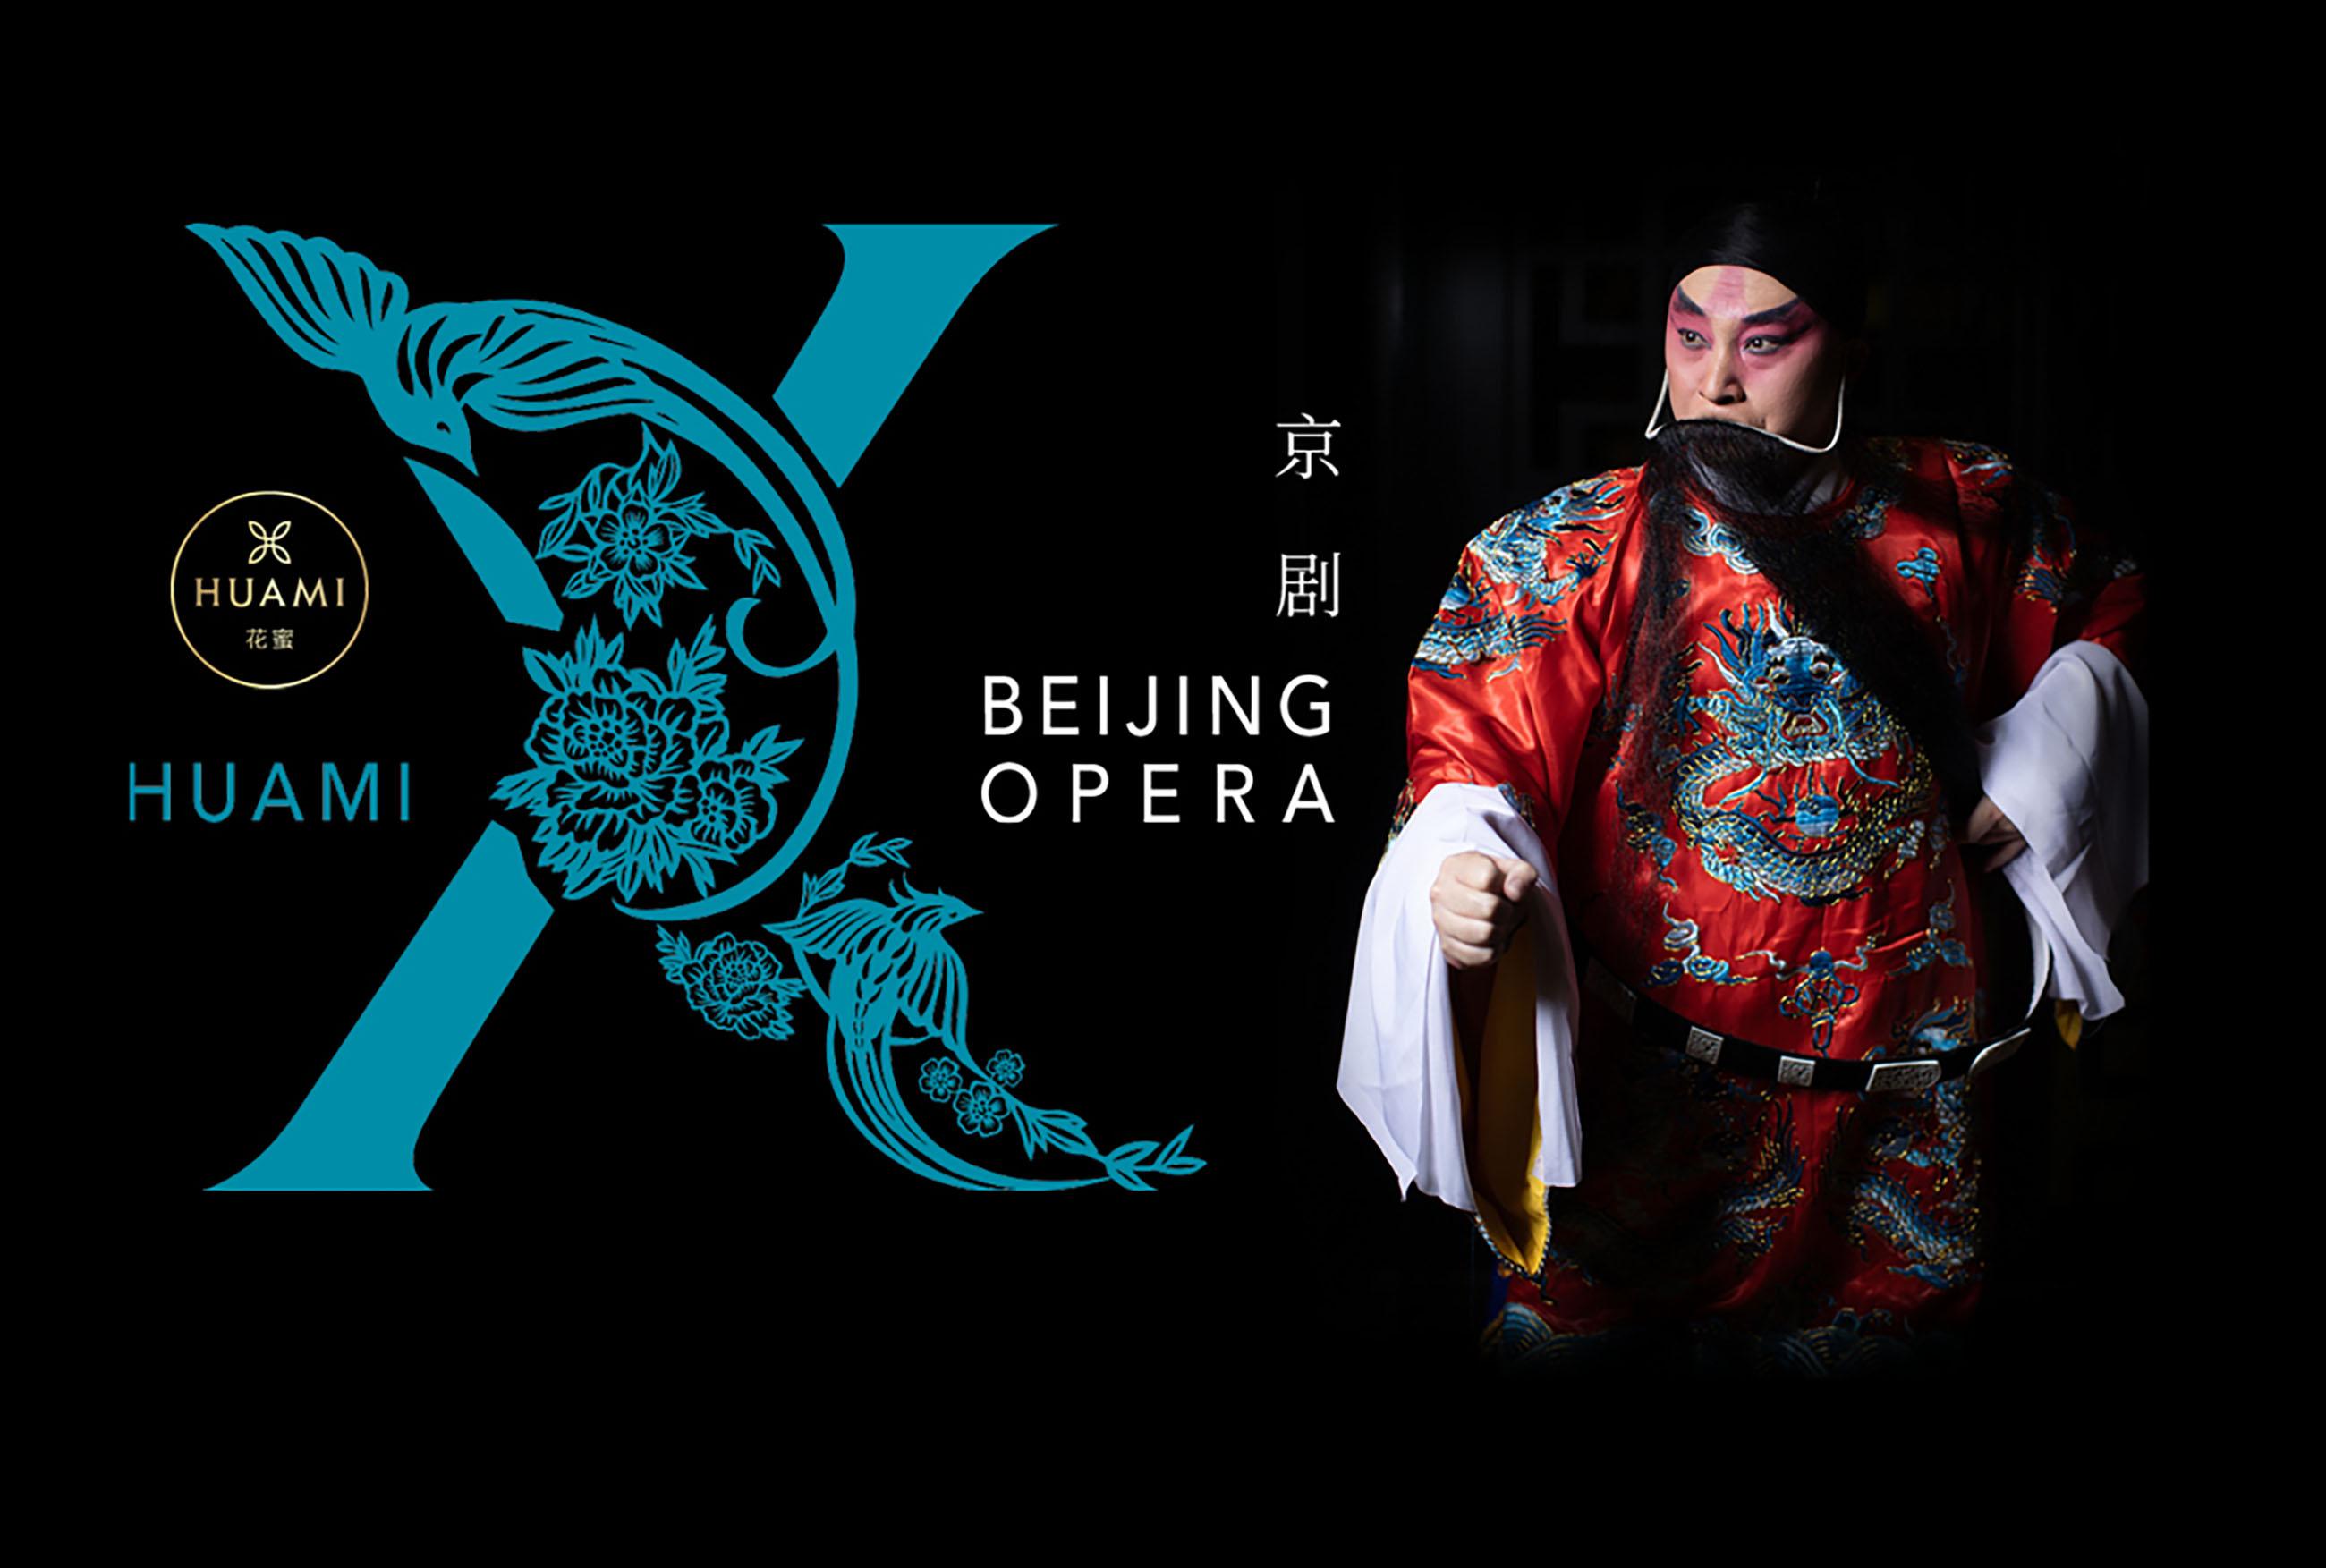 HuamiX - Beijing Opera